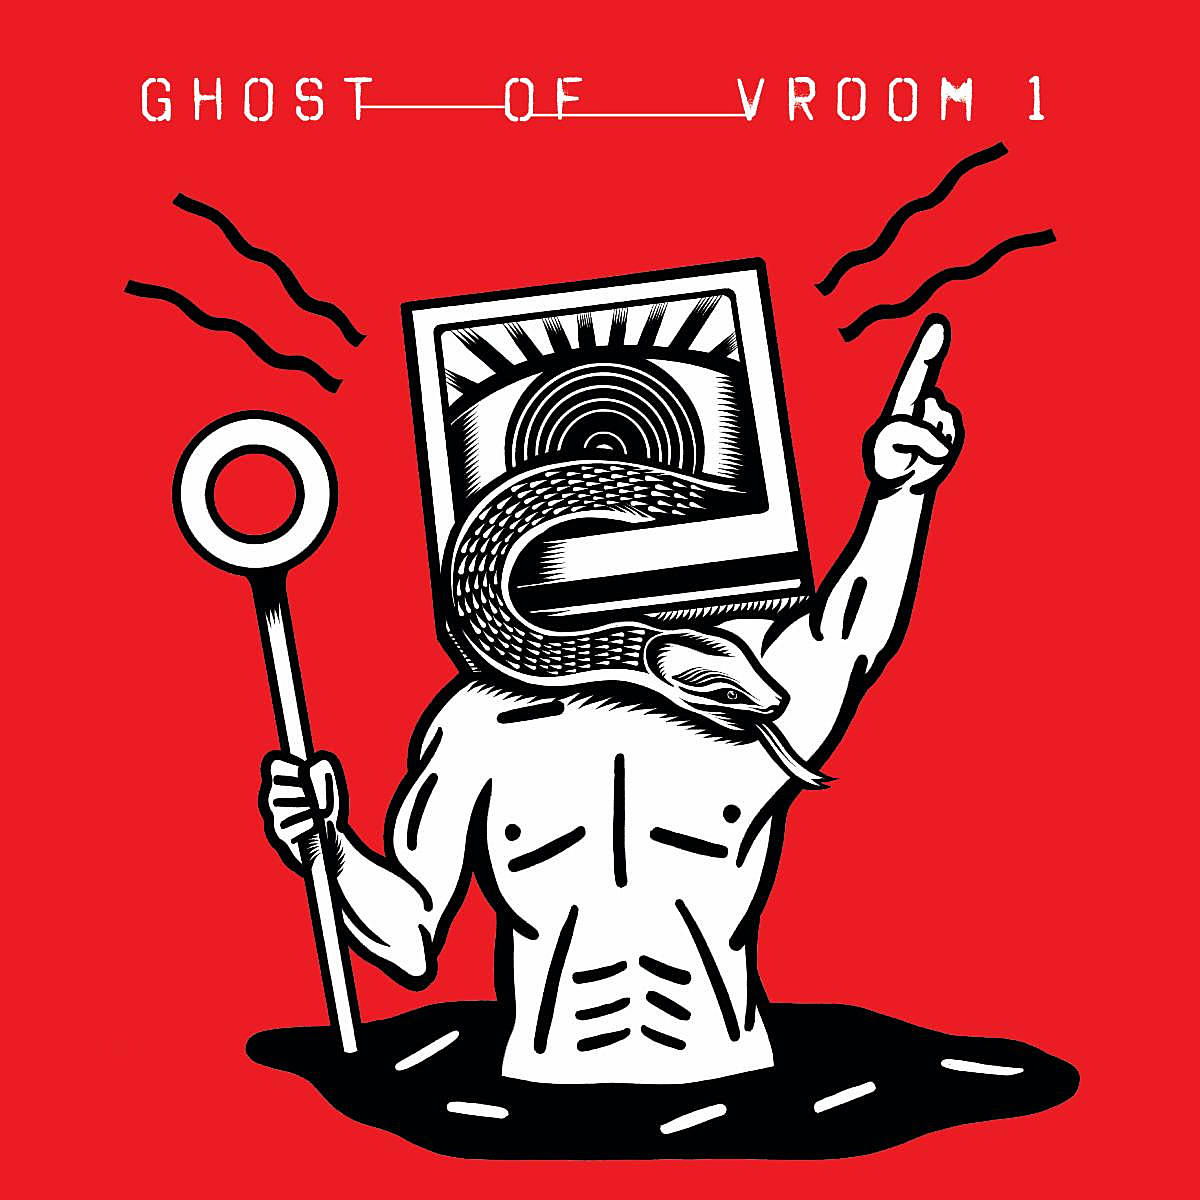 Ghost Of Vroom: Ghost Of Vroom 1 [Album Review]